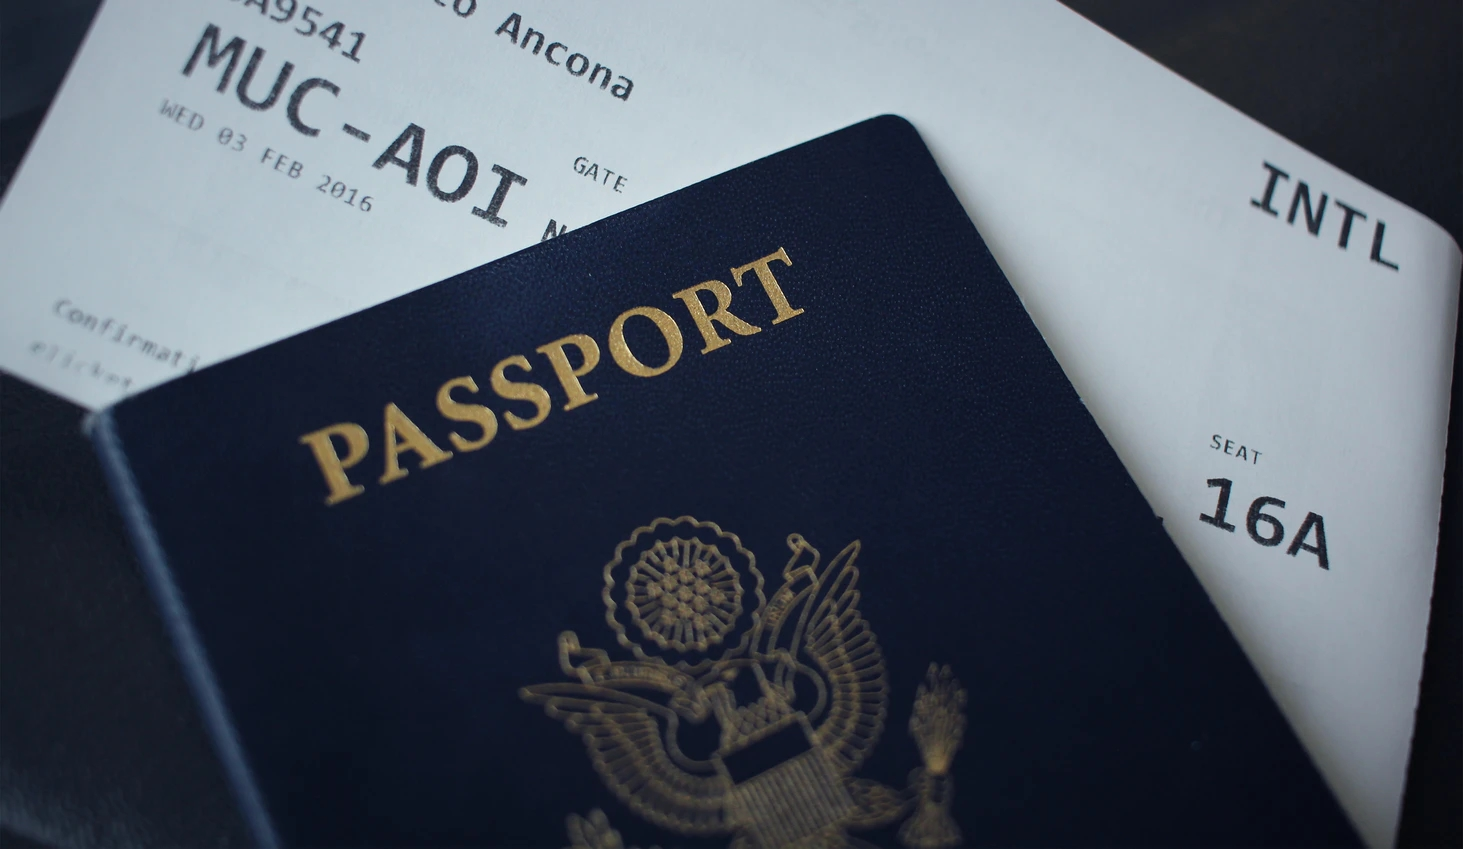 Passaporte imagem